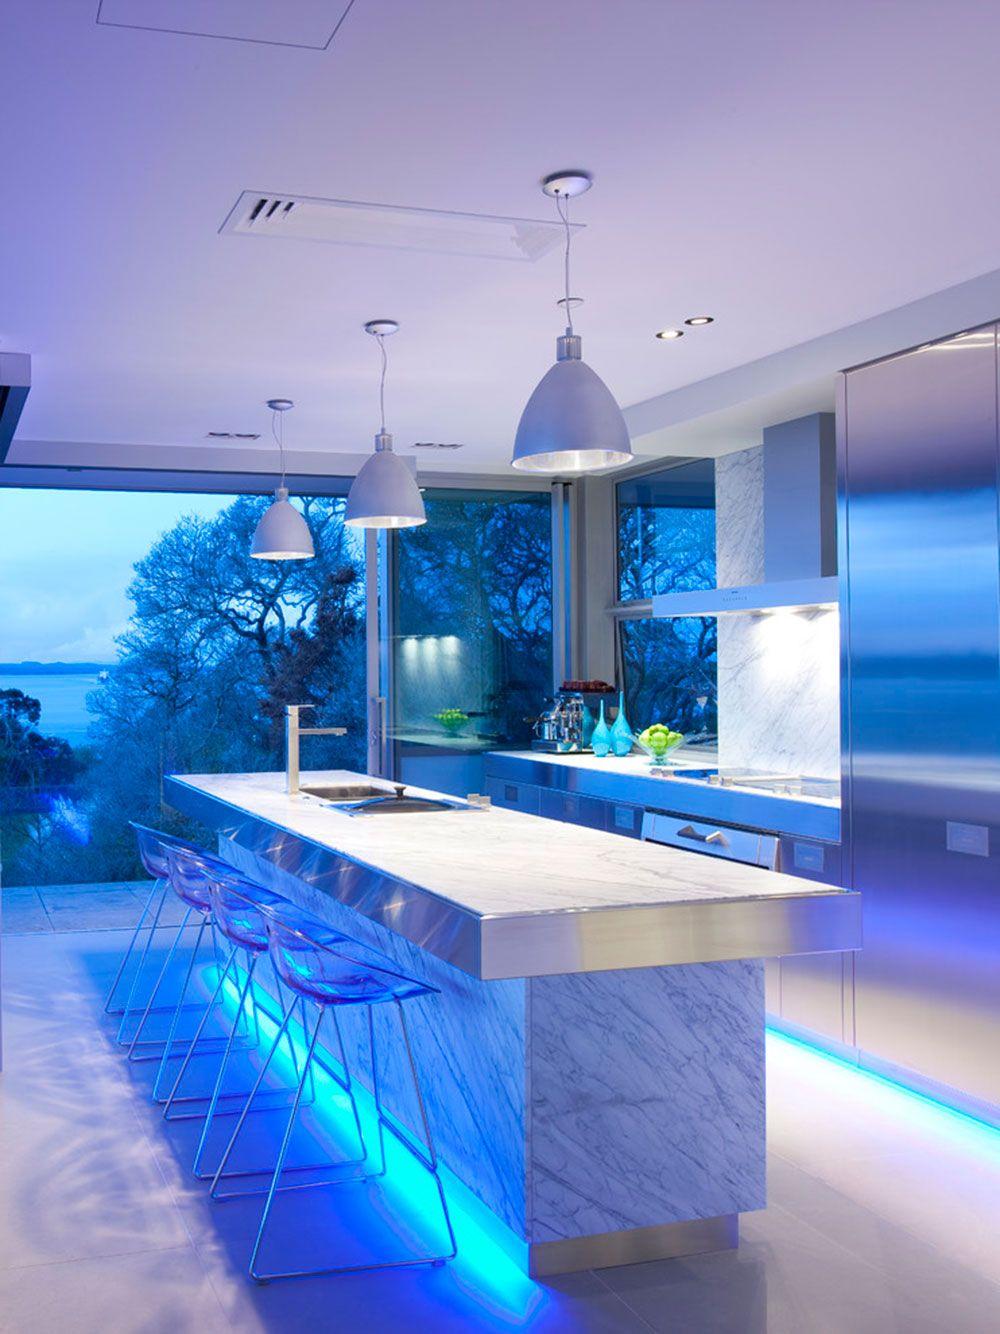 Advantages Of Using Led Lights For Home Interior Haus Design Design Und Modern